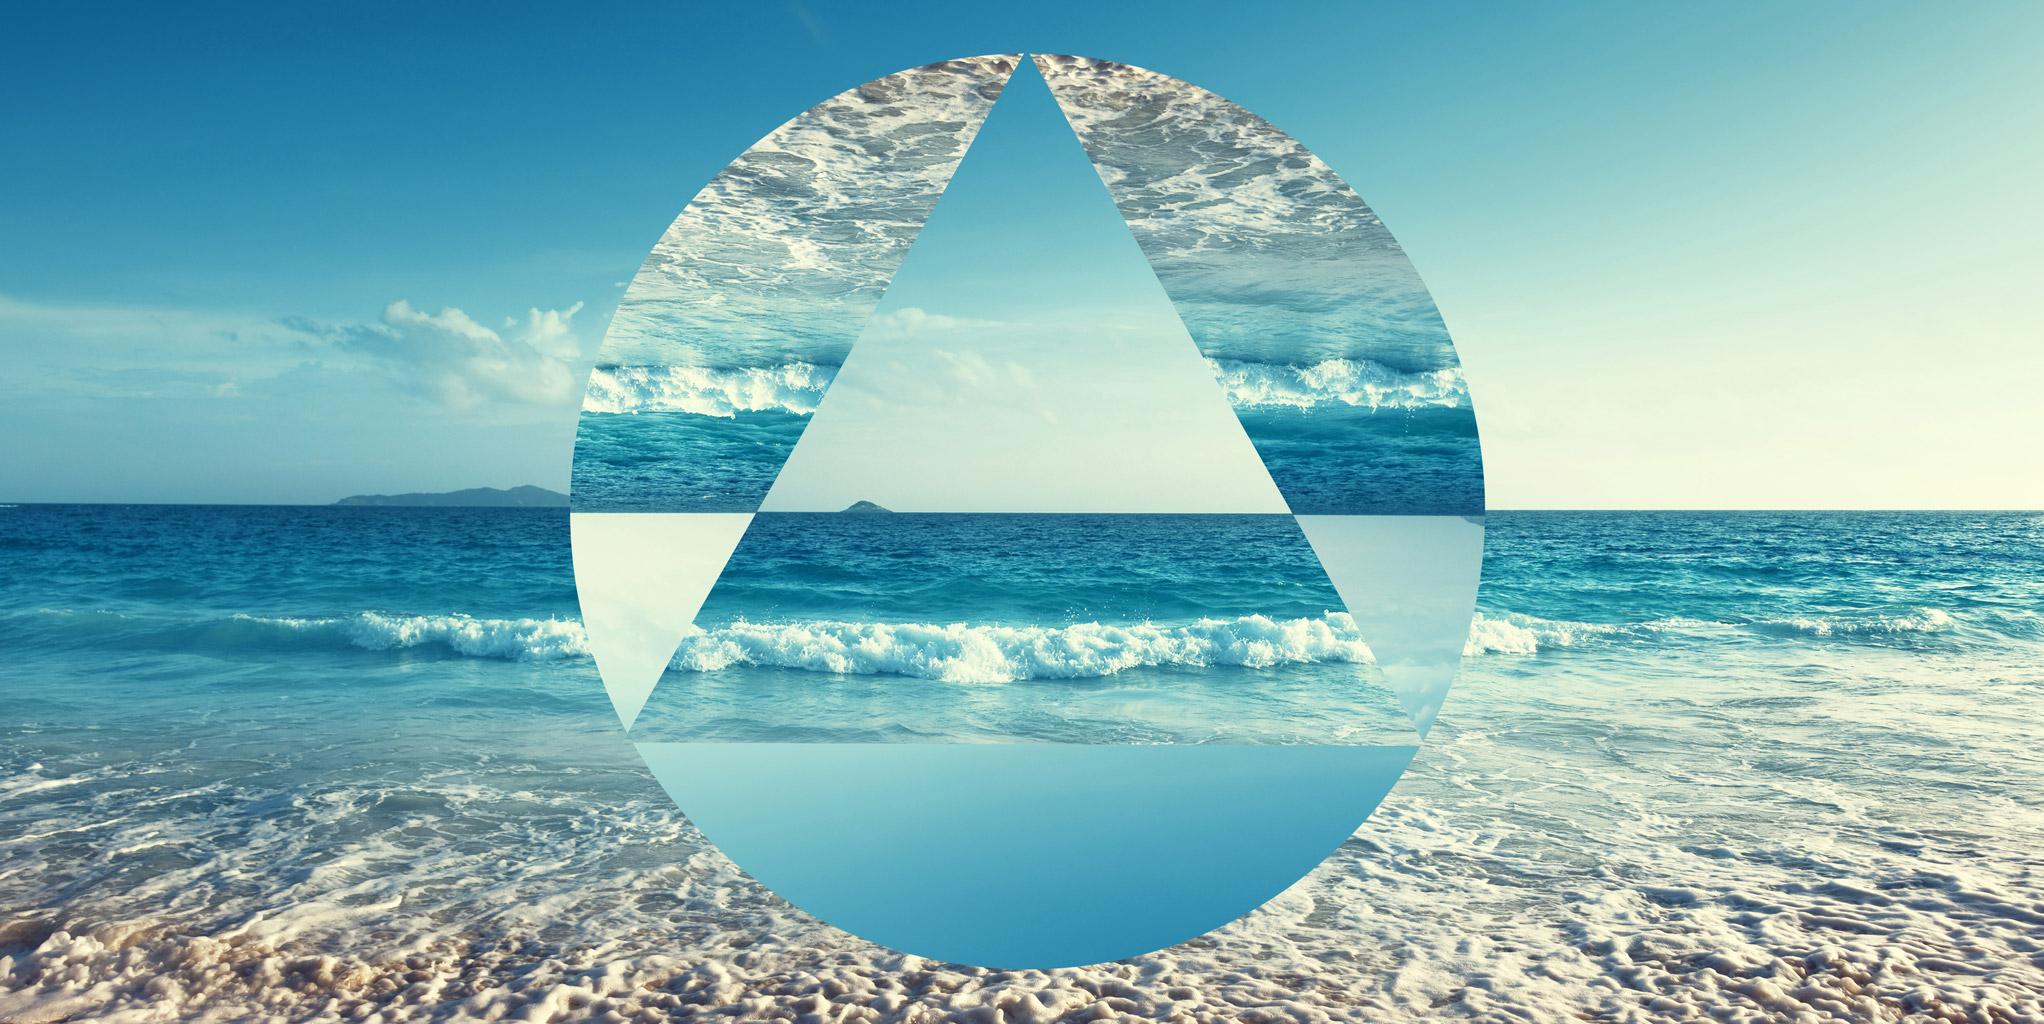 Beach-monogram_19.07.16_FINAL